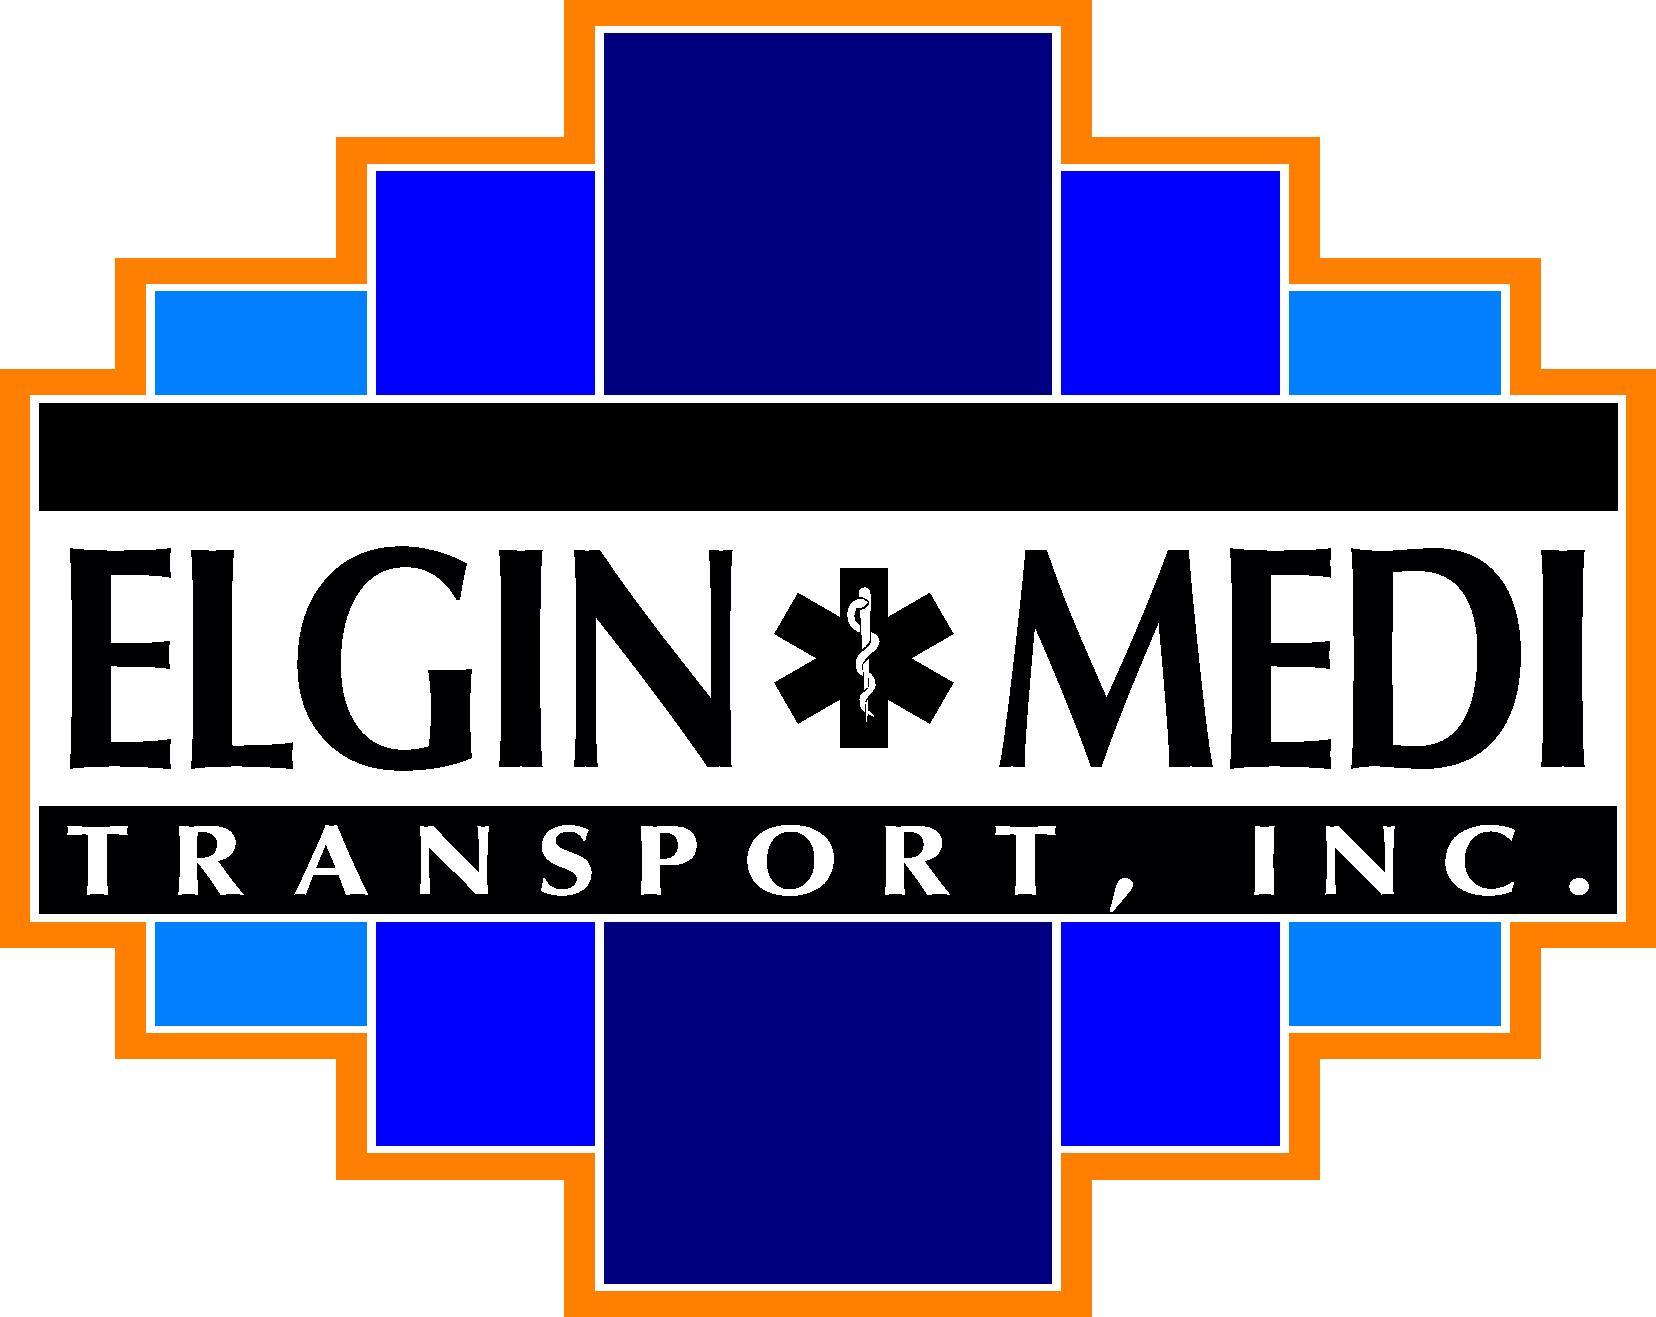 Elgin_Medi_Transport.jpg